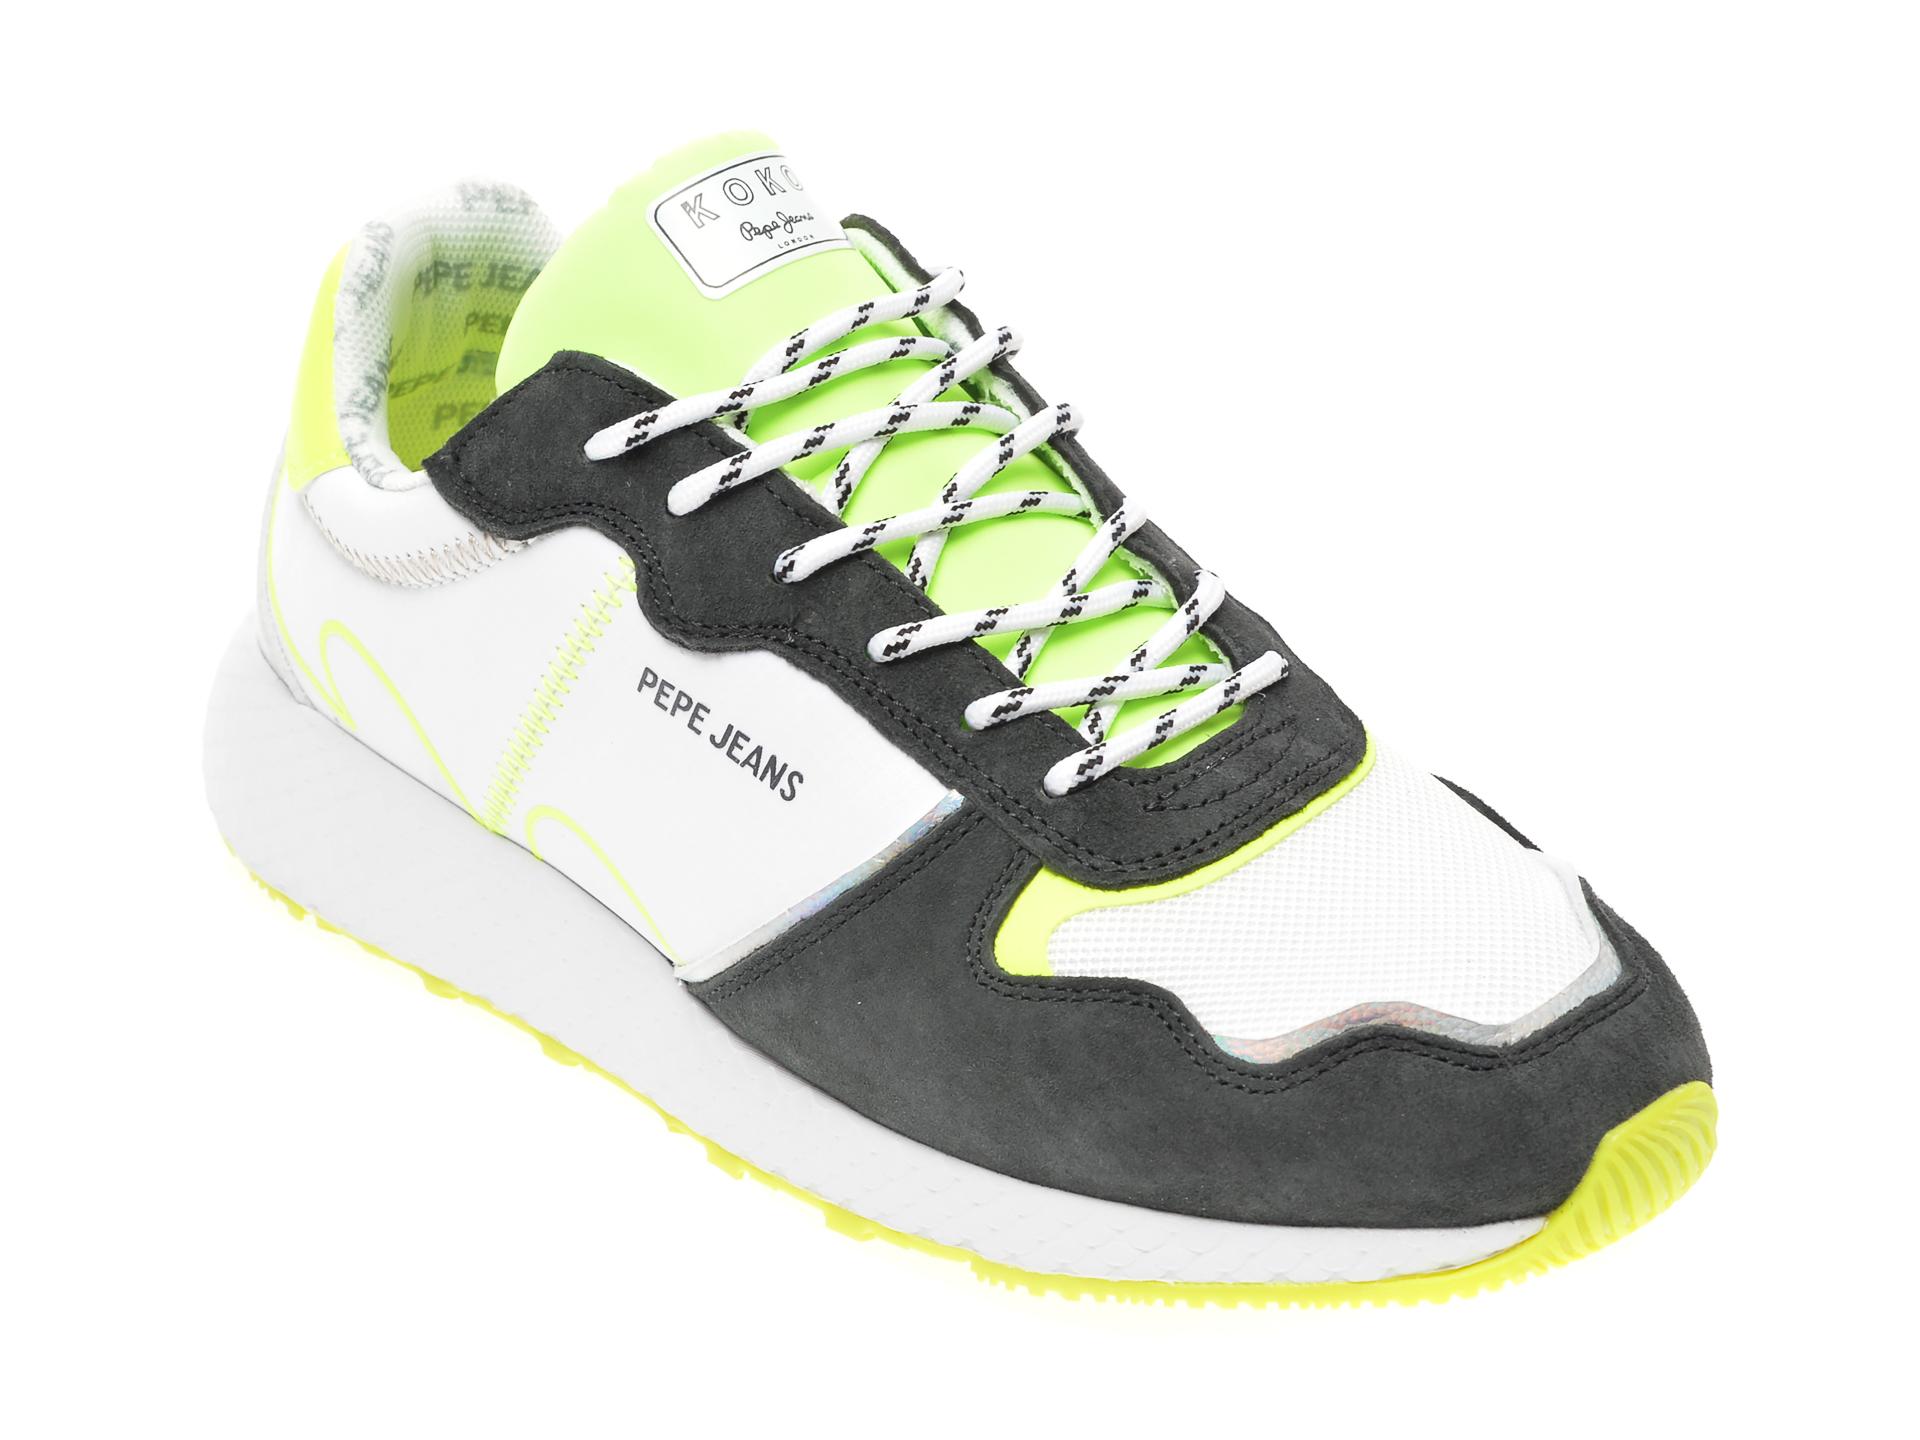 Pantofi sport PEPE JEANS albi, LS30997, din material textil si piele intoarsa